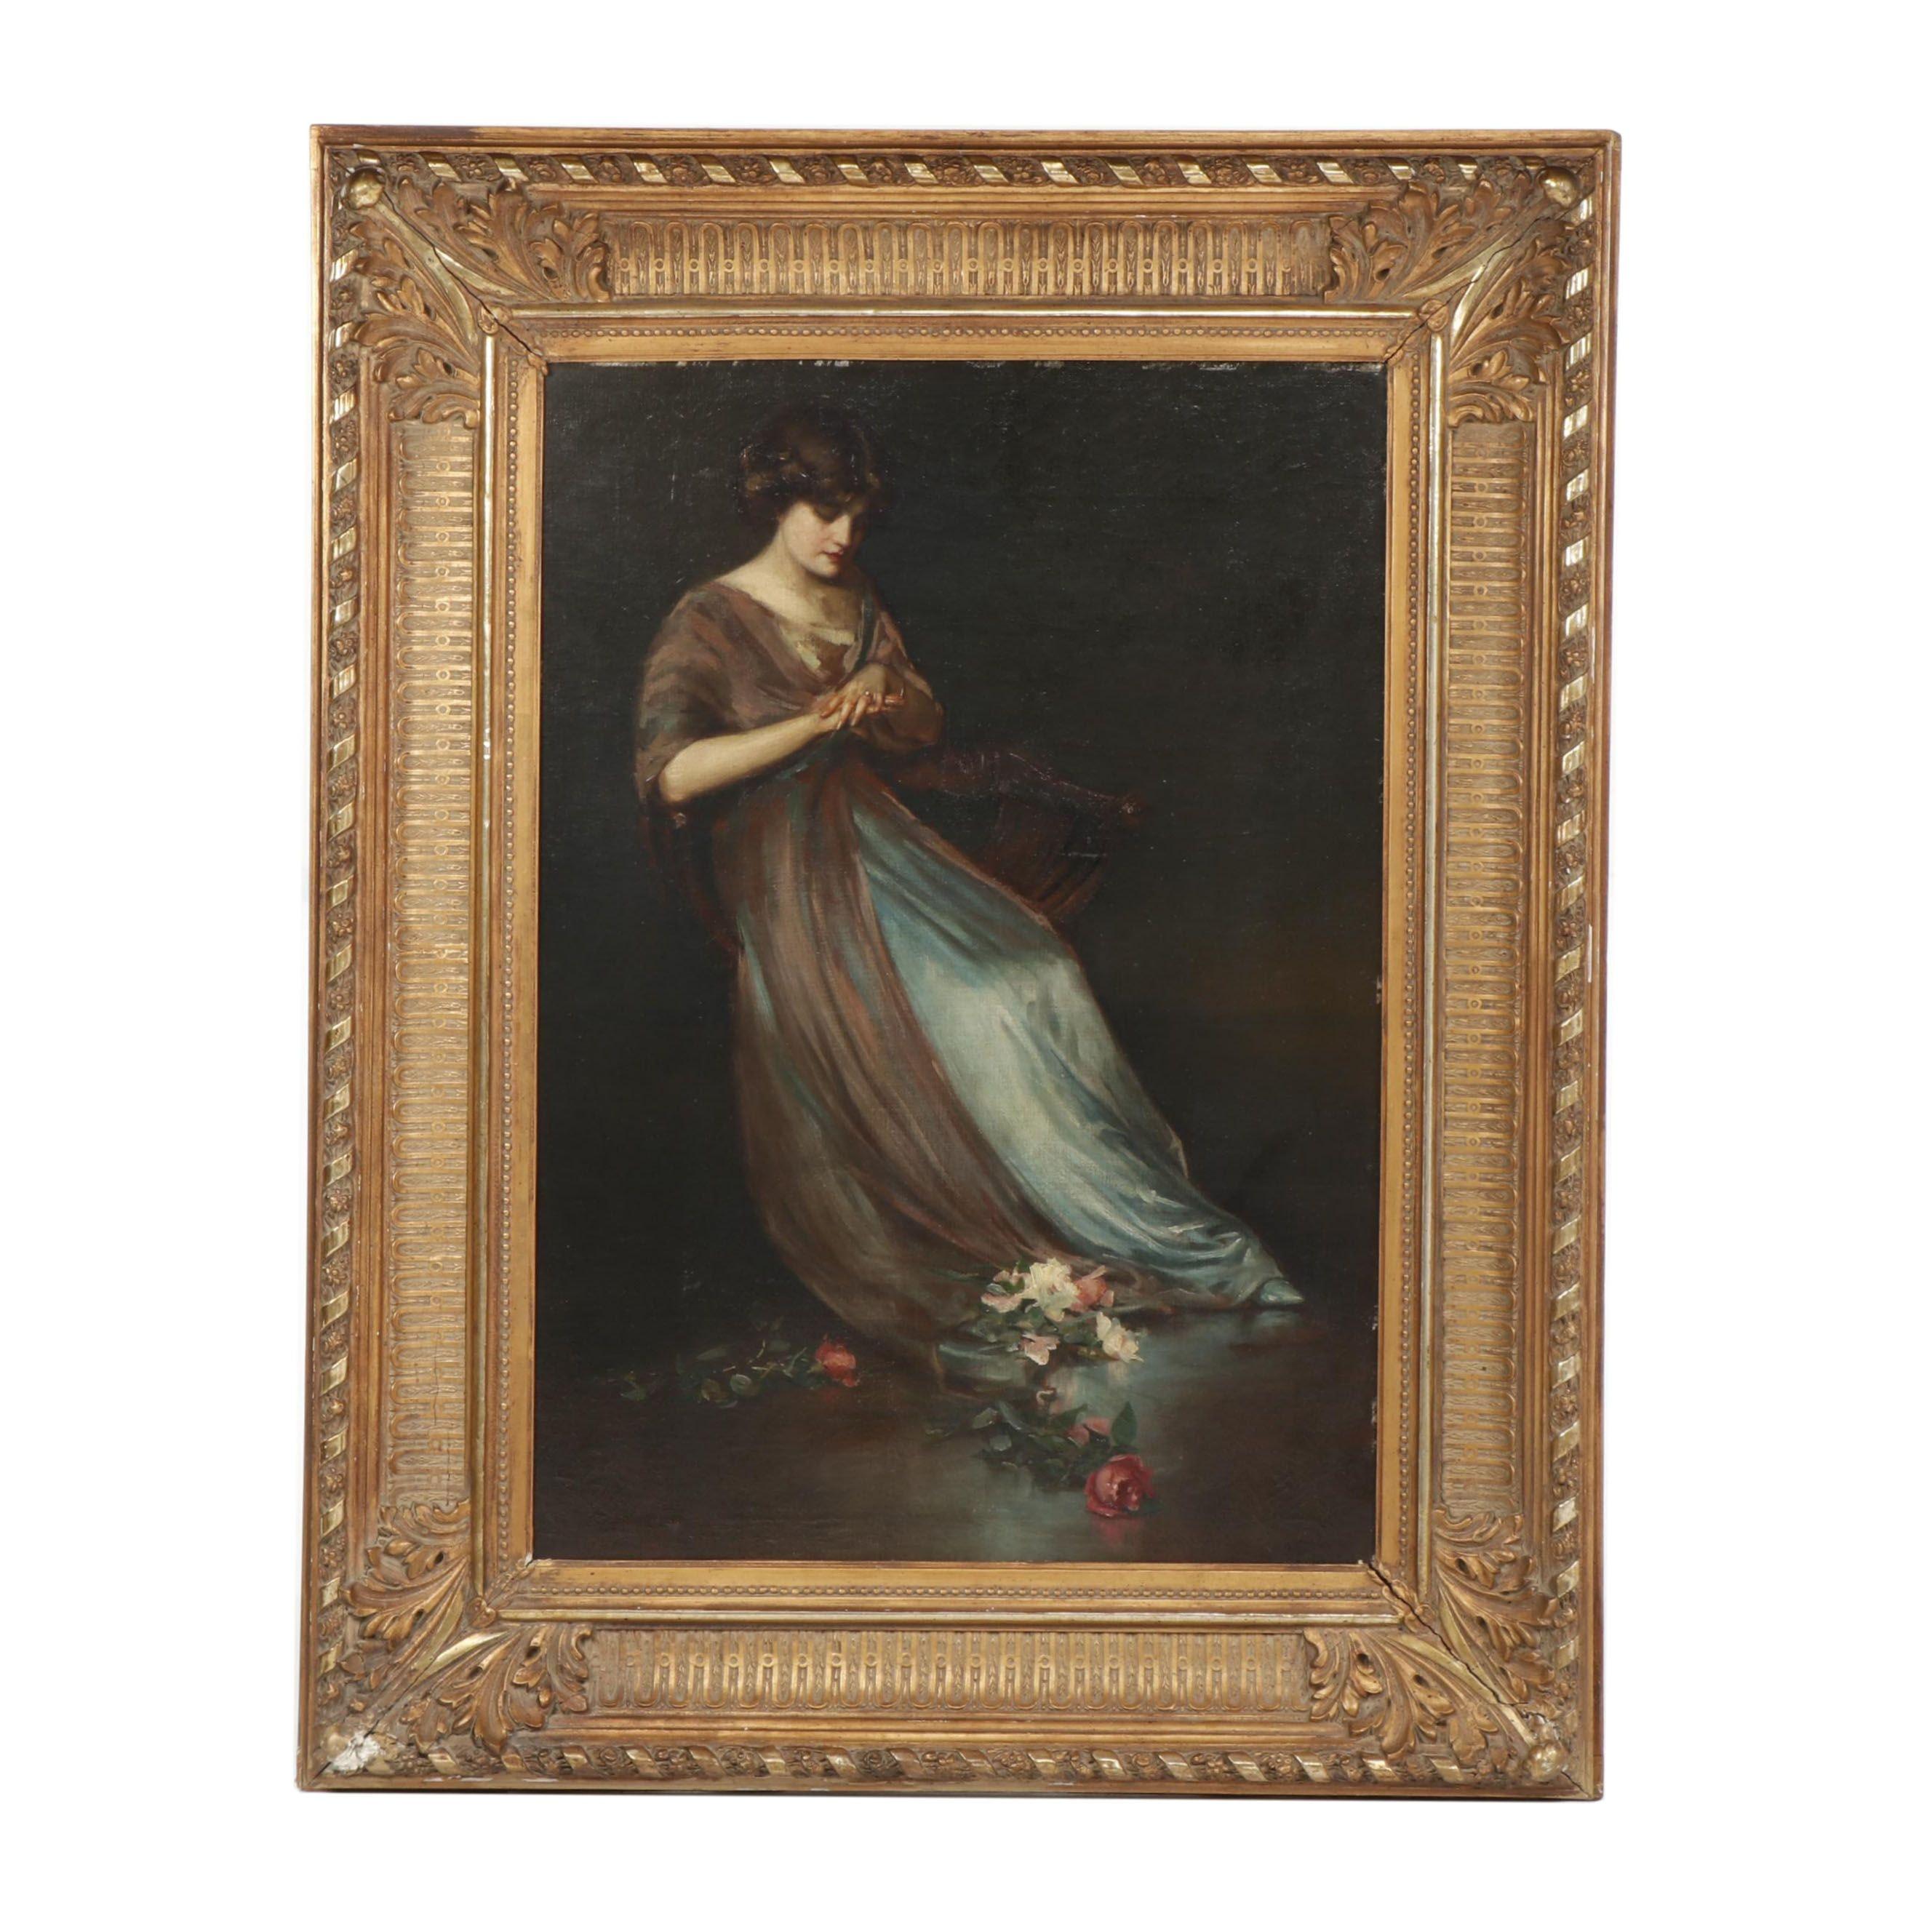 Z.P. Nikolaki Oil Painting of a Woman